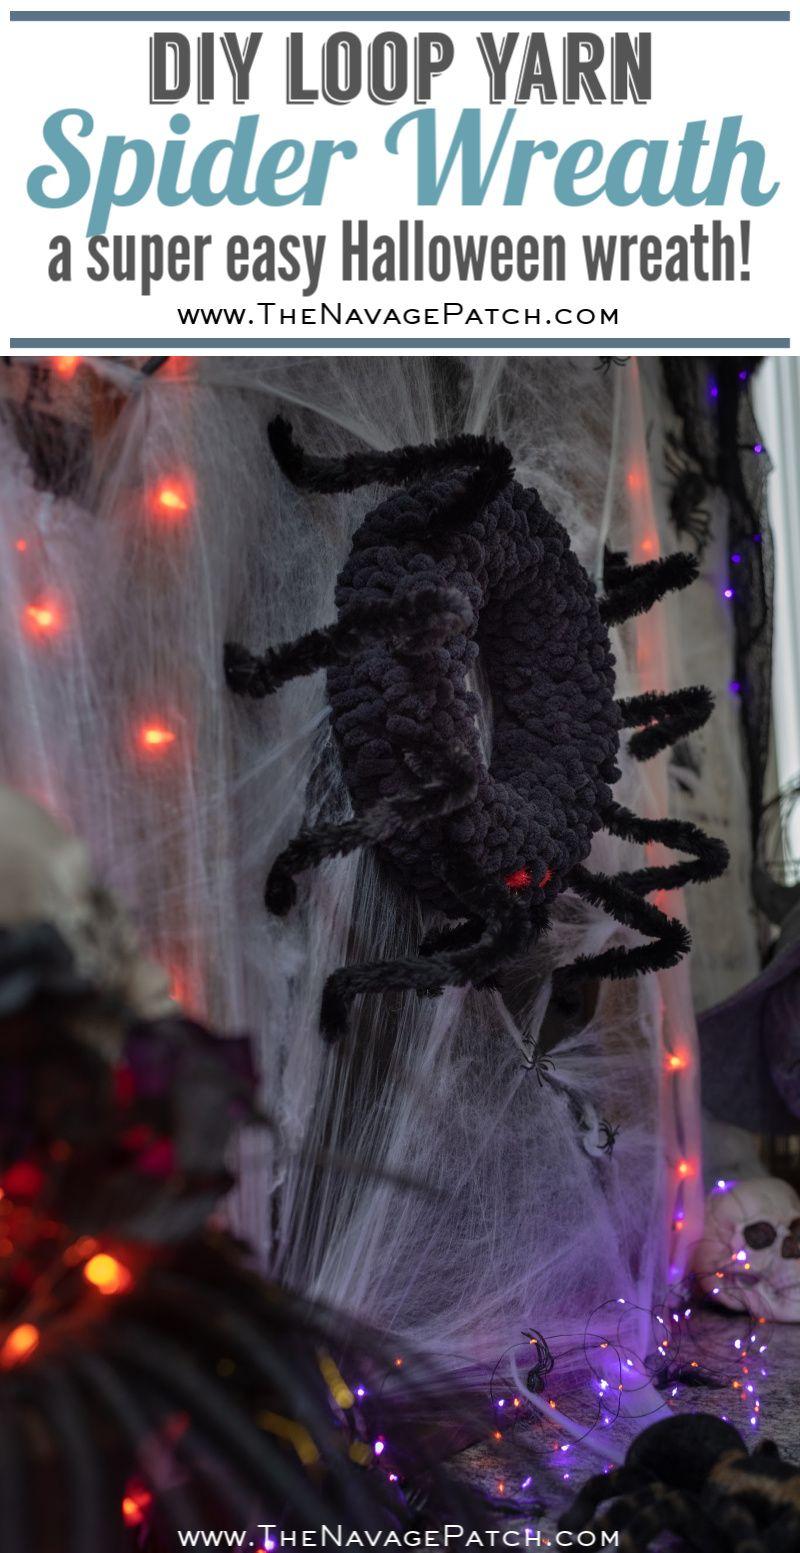 Diy Spider Wreath The Navage Patch